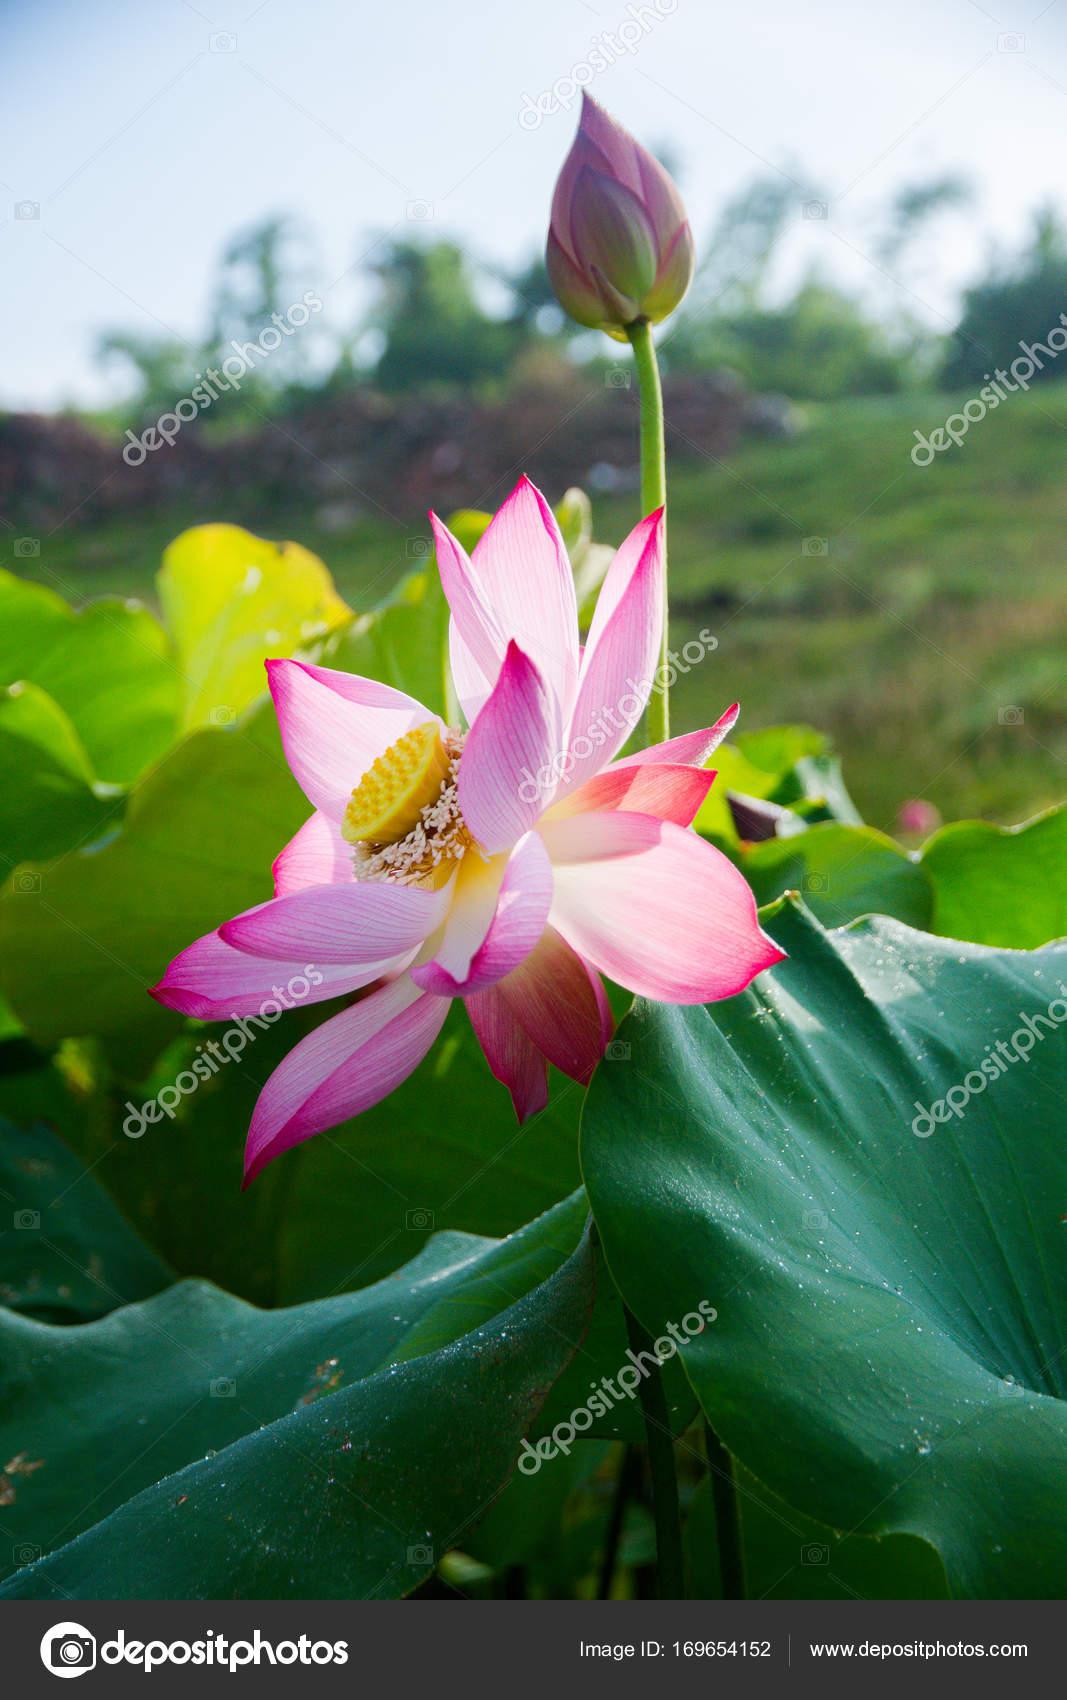 Beauty lotus flowers garden stock photo cristaltran 169654152 beauty lotus flowers garden stock photo izmirmasajfo